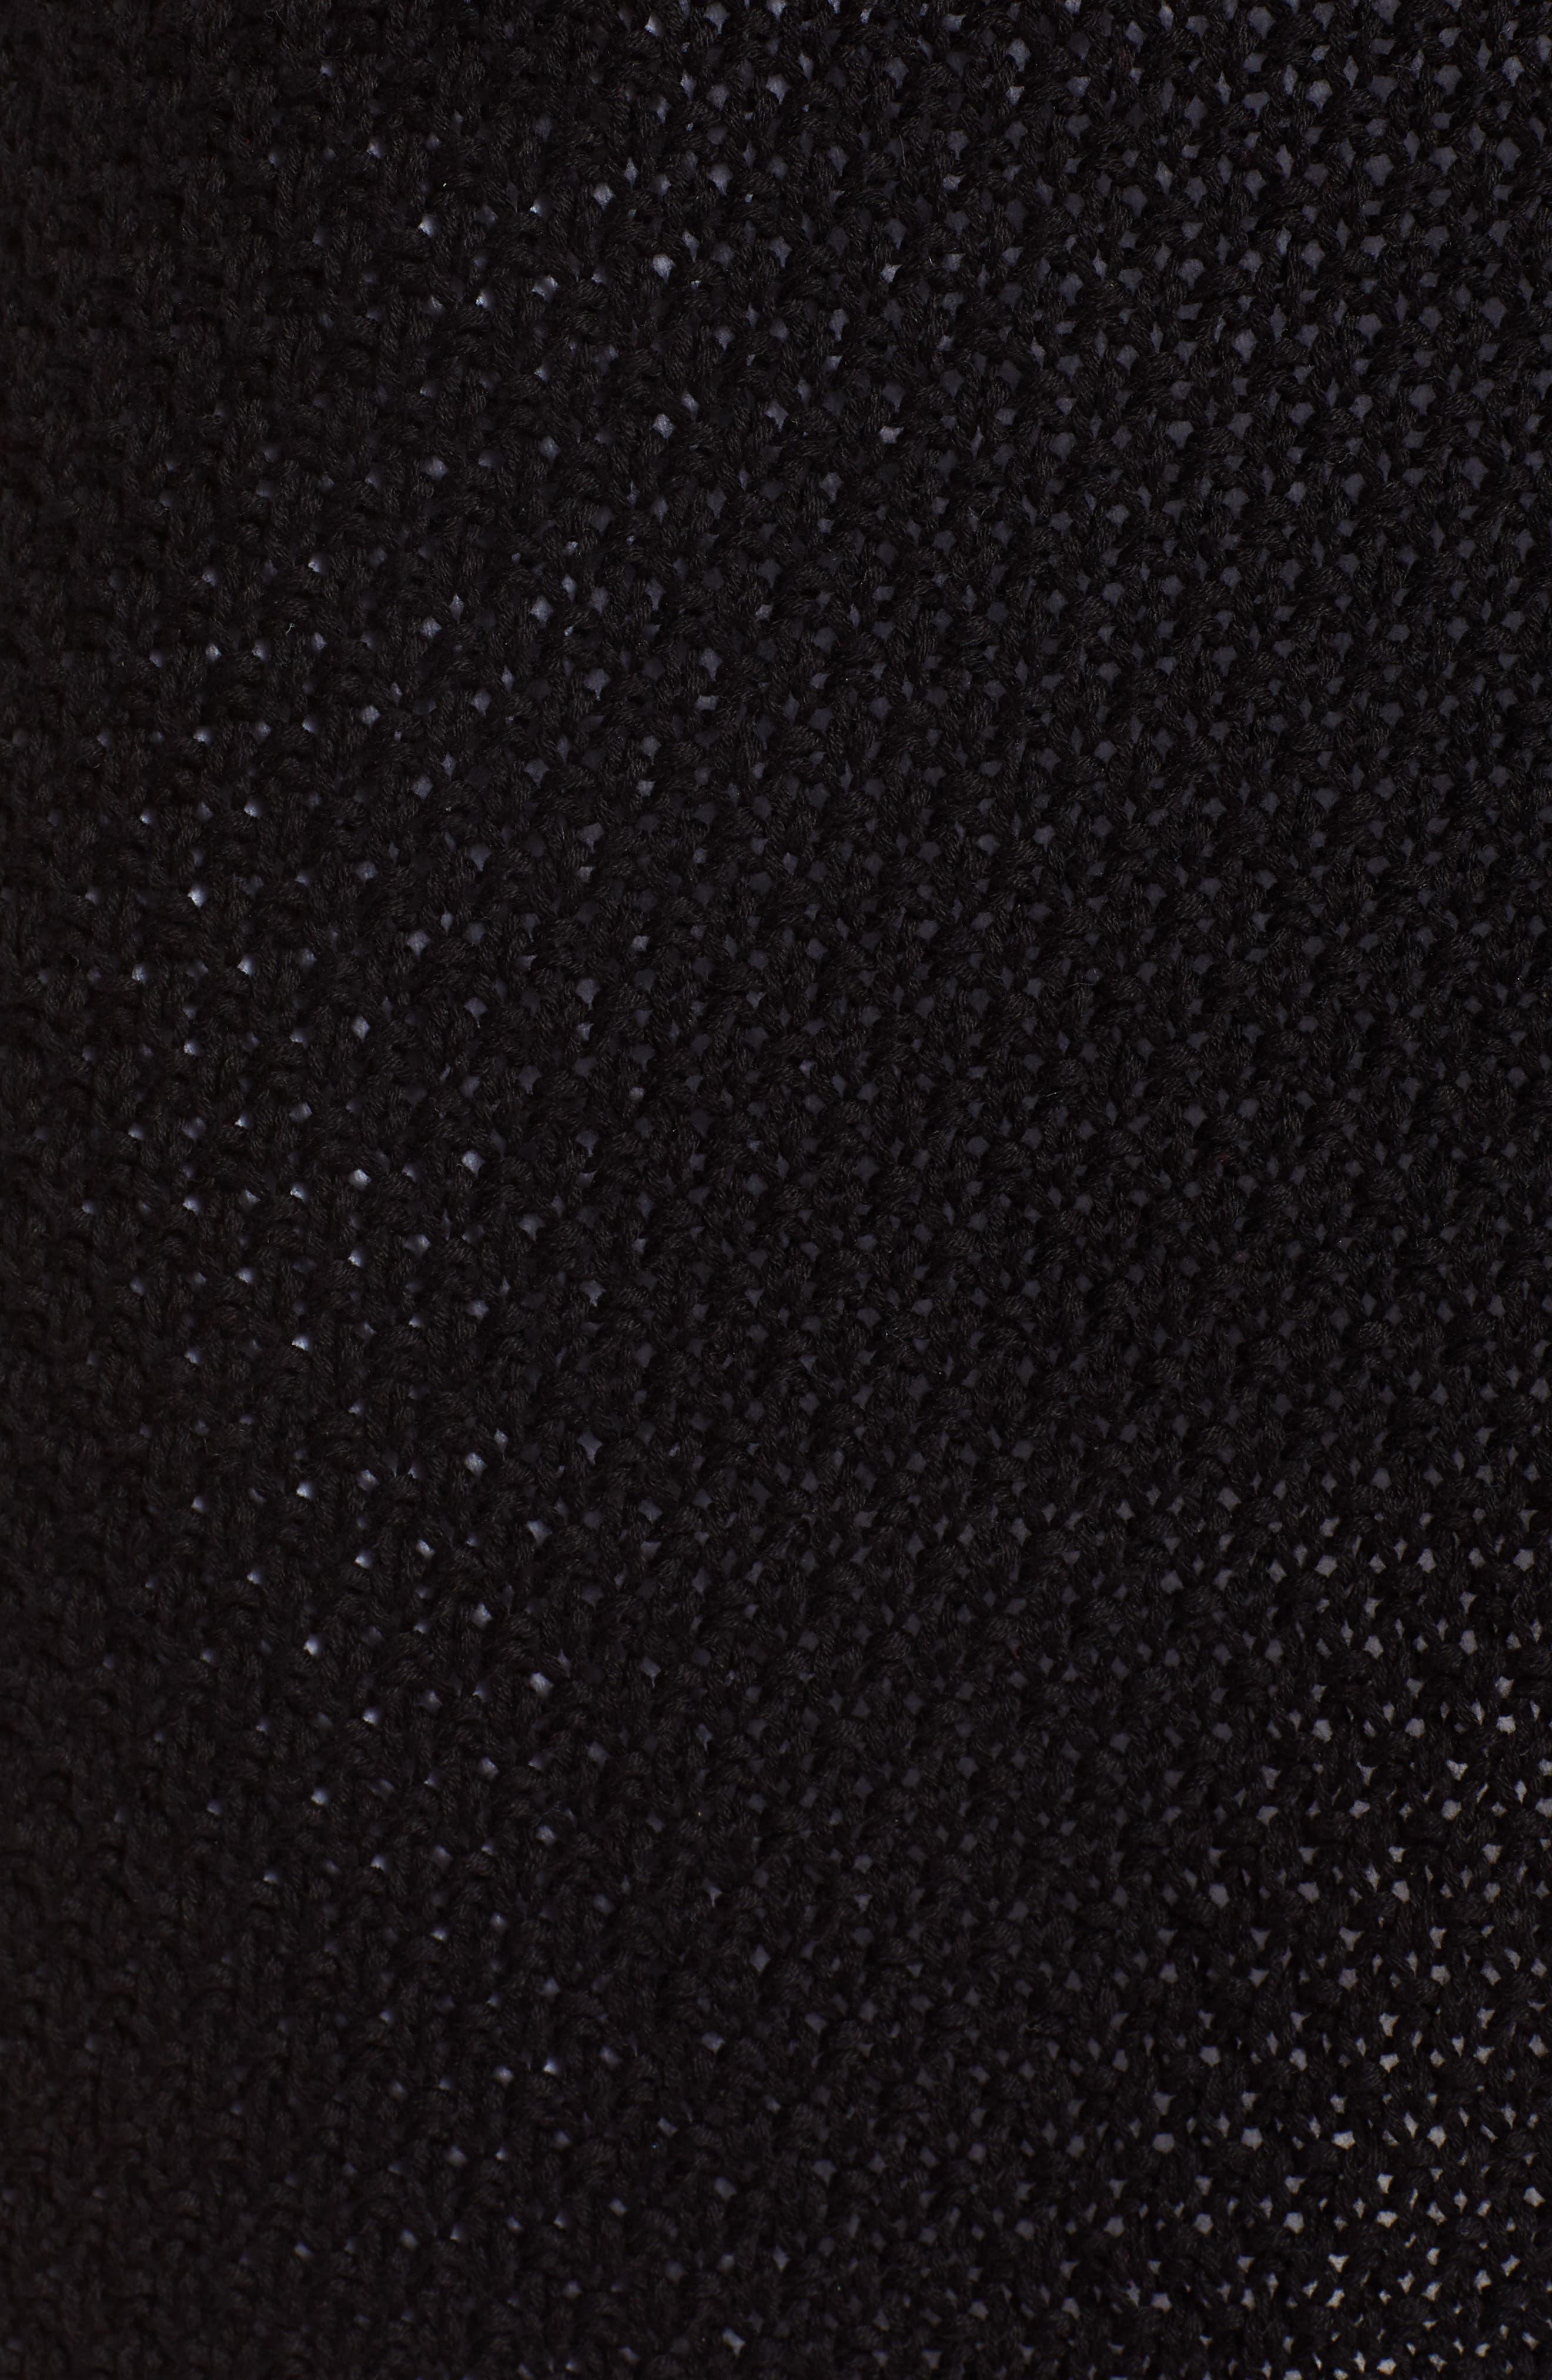 Textured Cotton Knit Cardigan,                             Alternate thumbnail 6, color,                             001